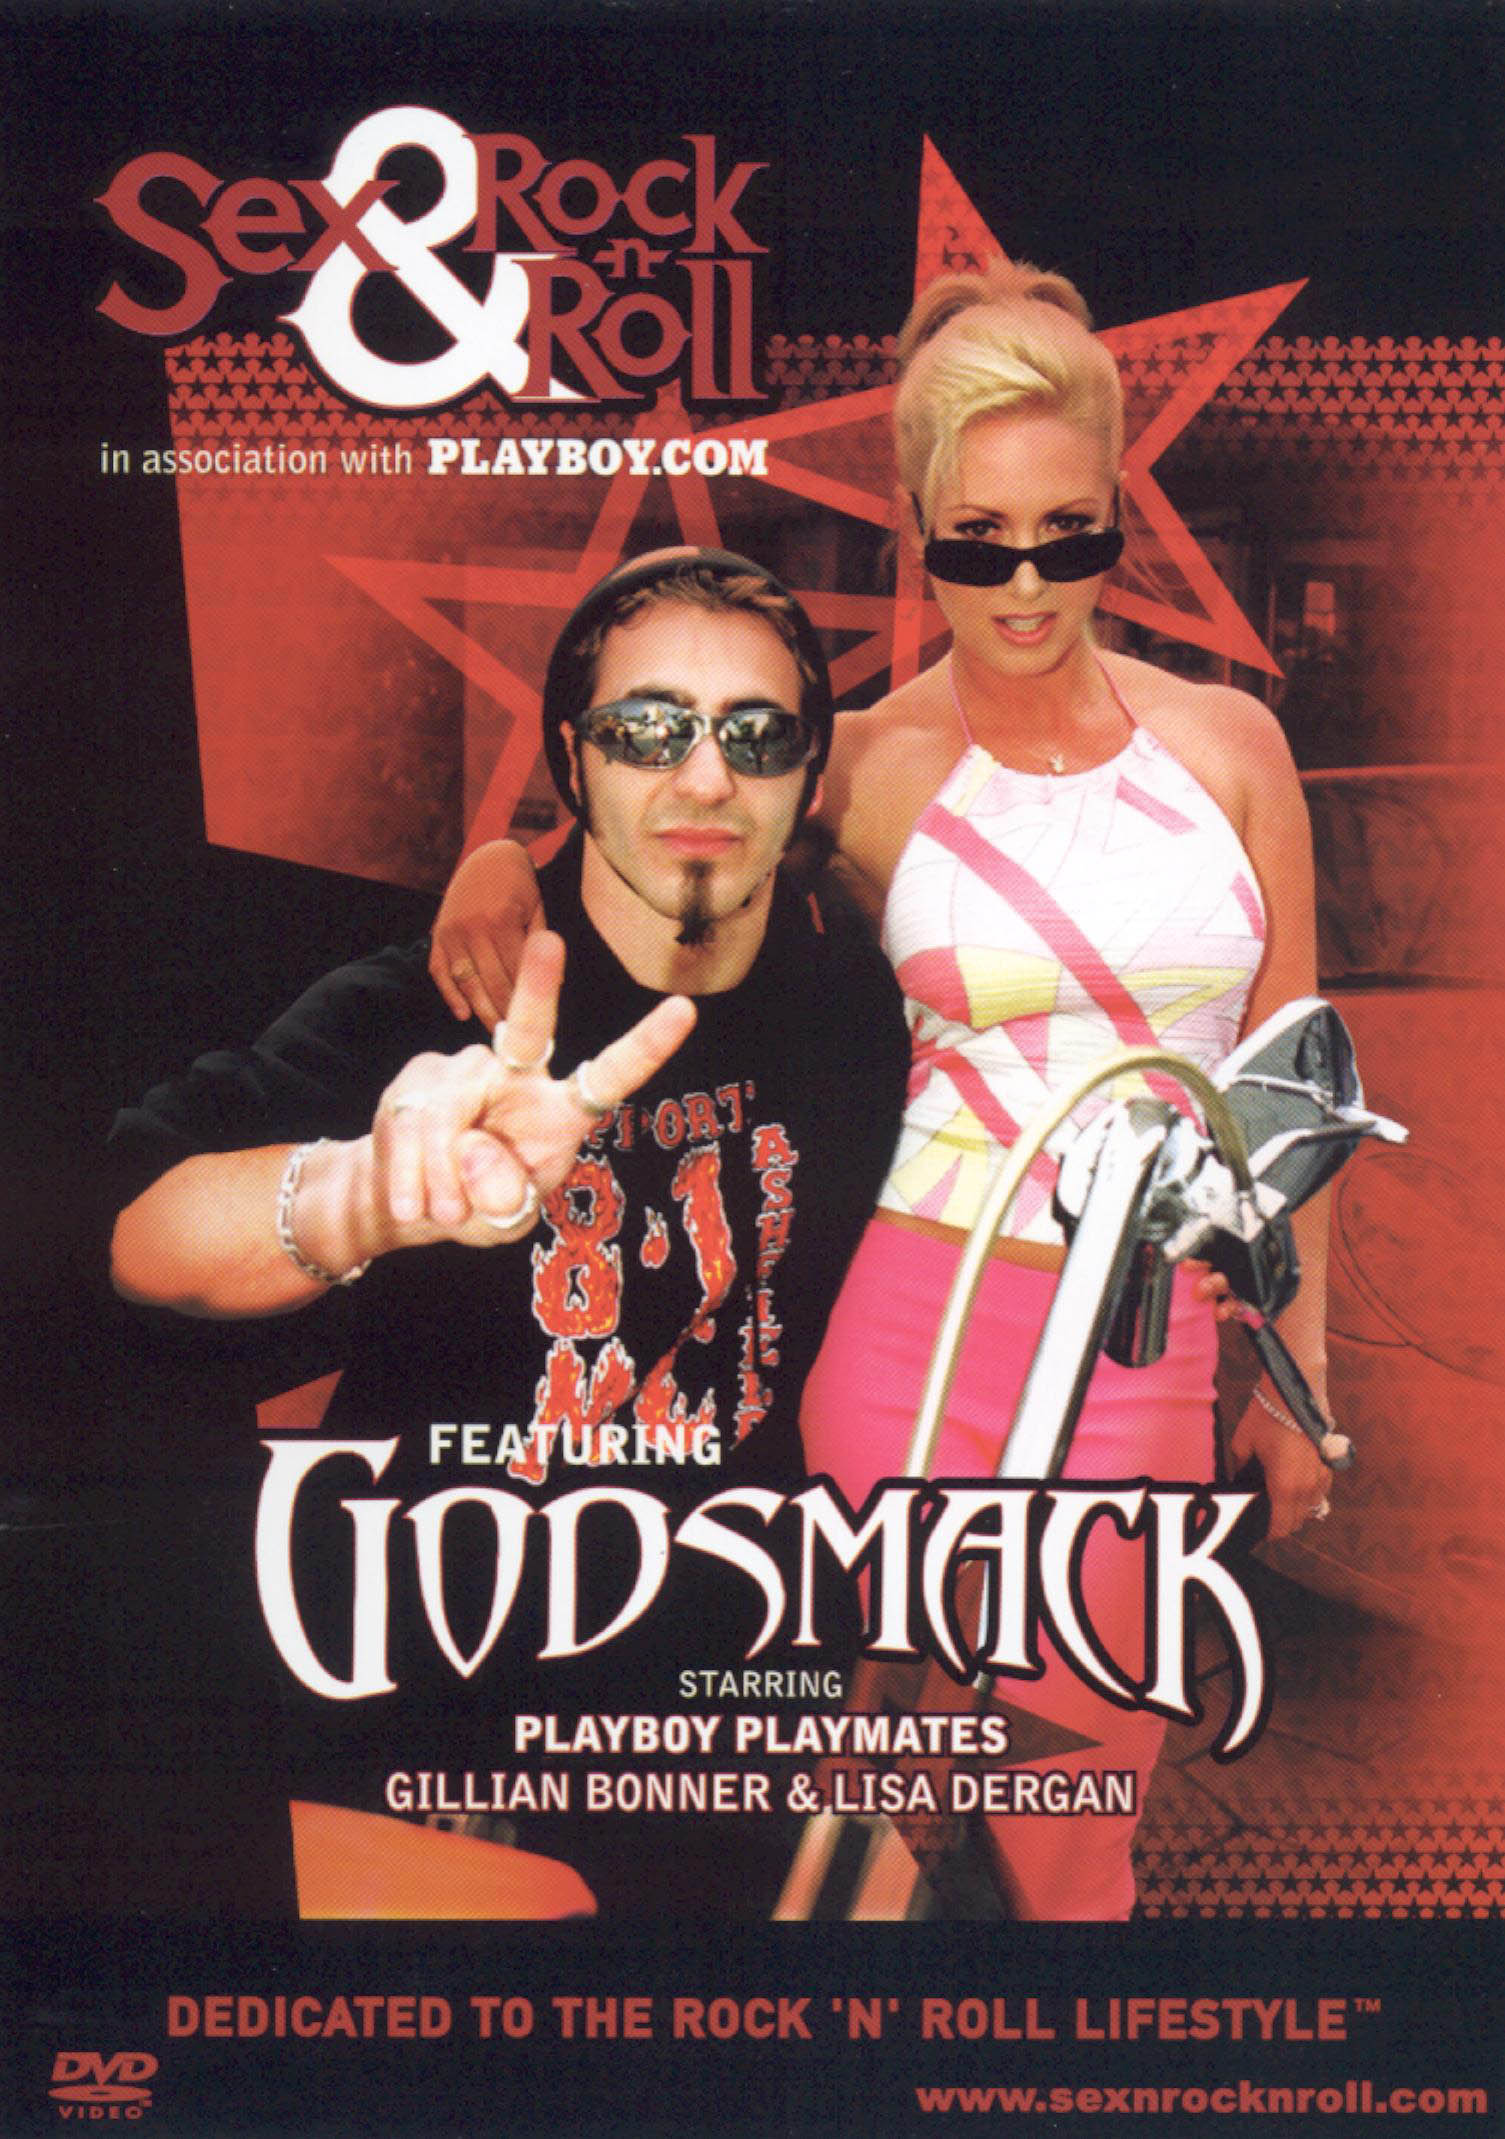 Sex & Rock'N'Roll: Godsmack